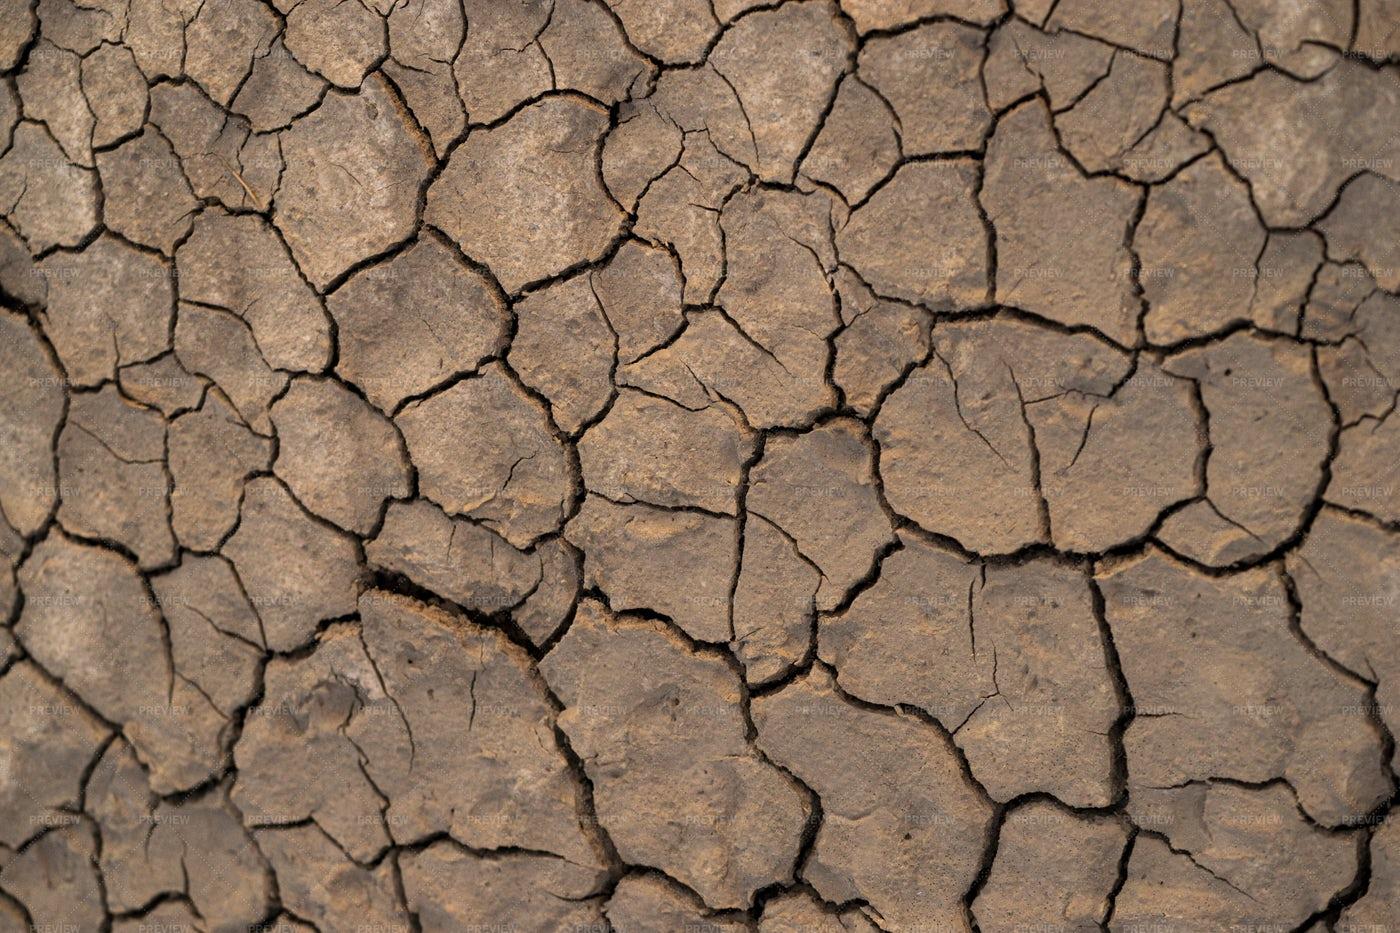 Cracked Soil: Stock Photos